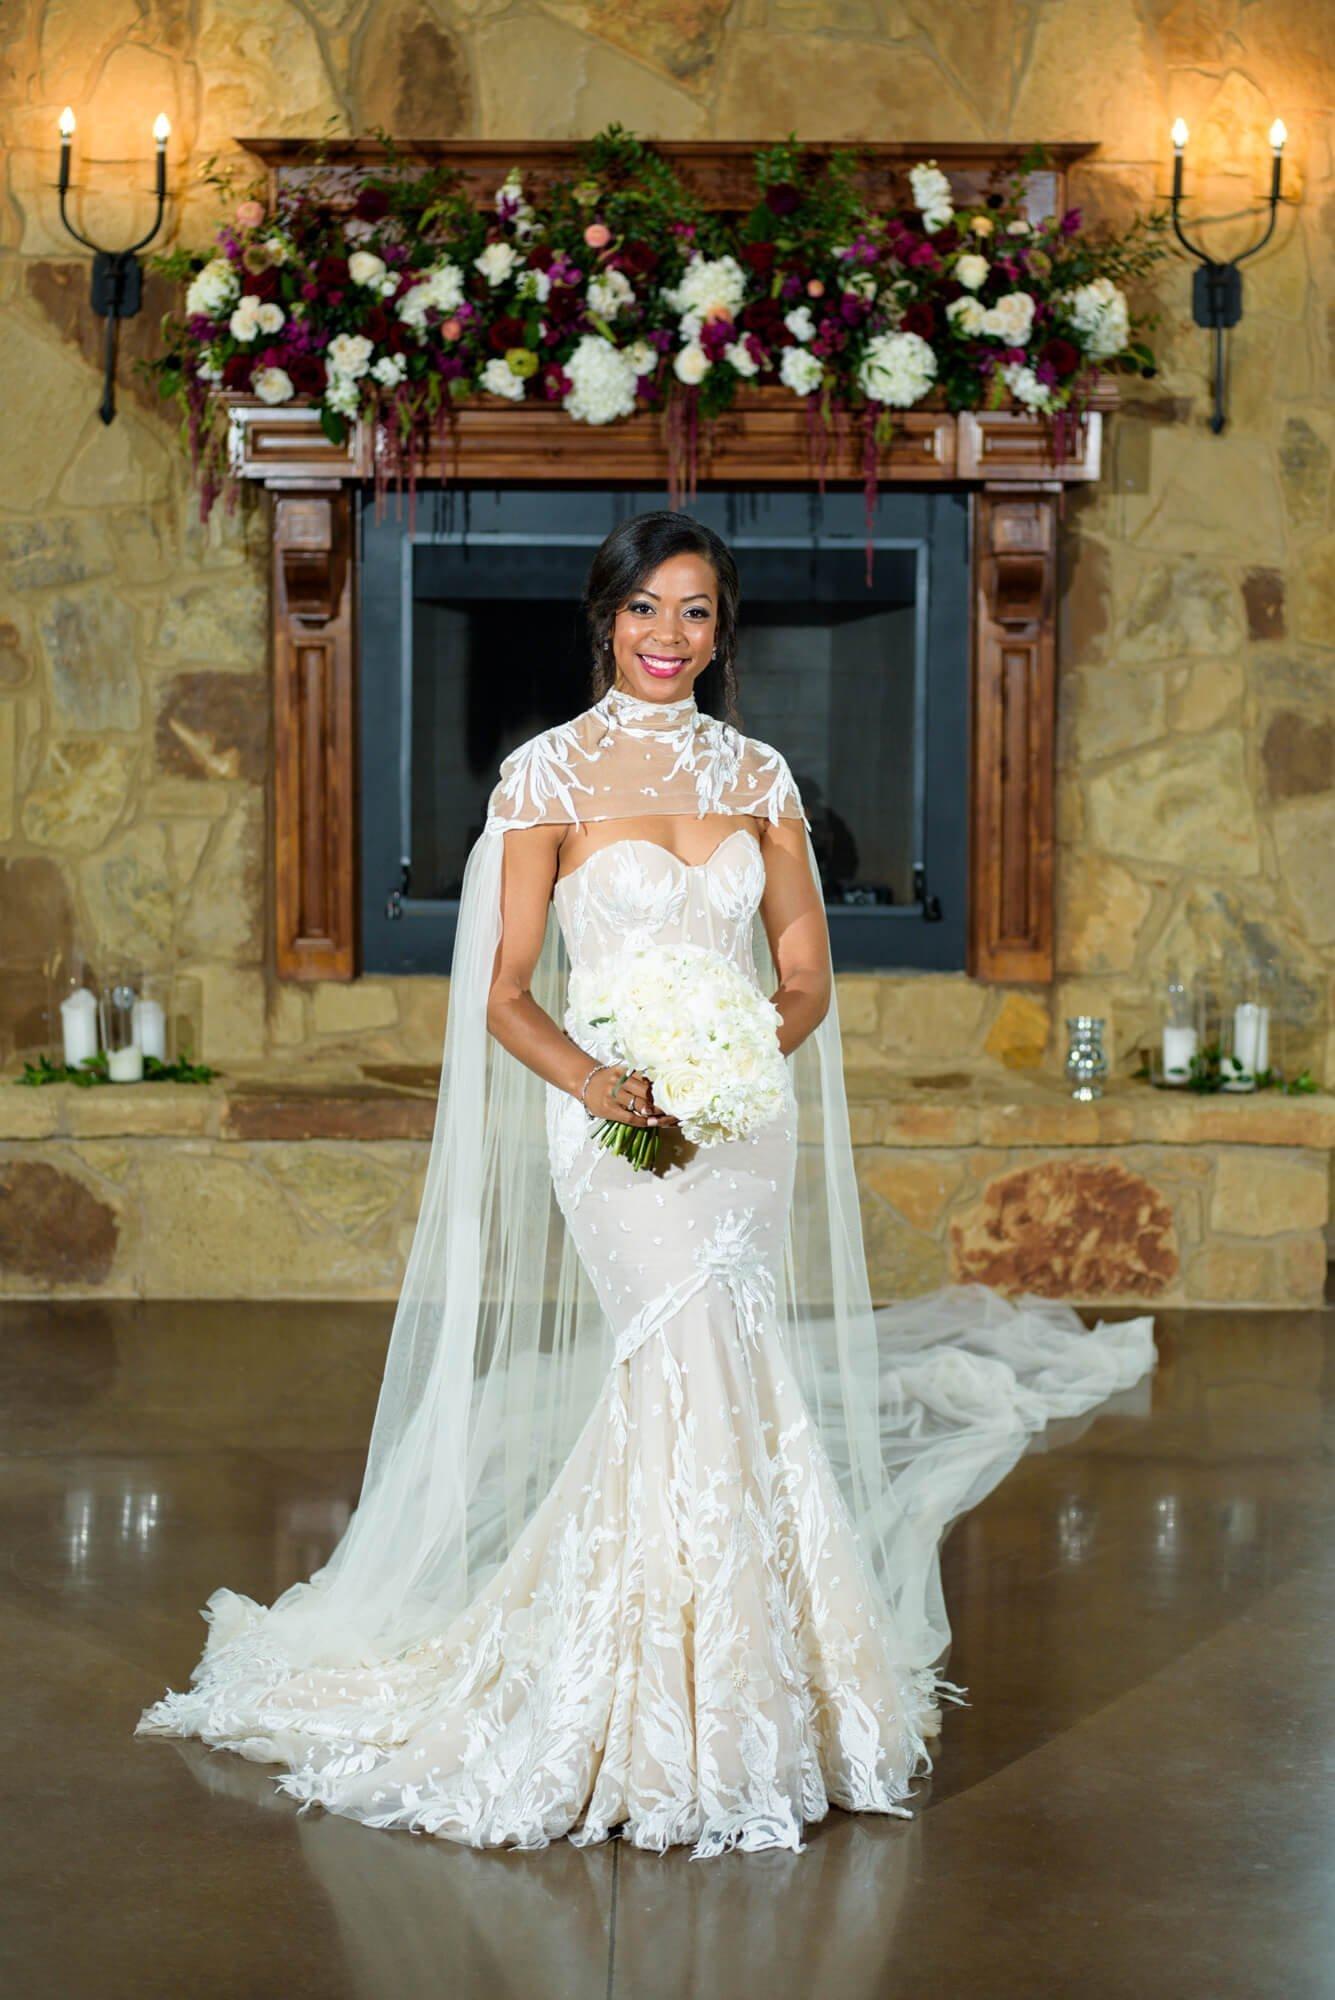 Baker Wedding - Jeremy Mennerick Photo - Bridal Portrait